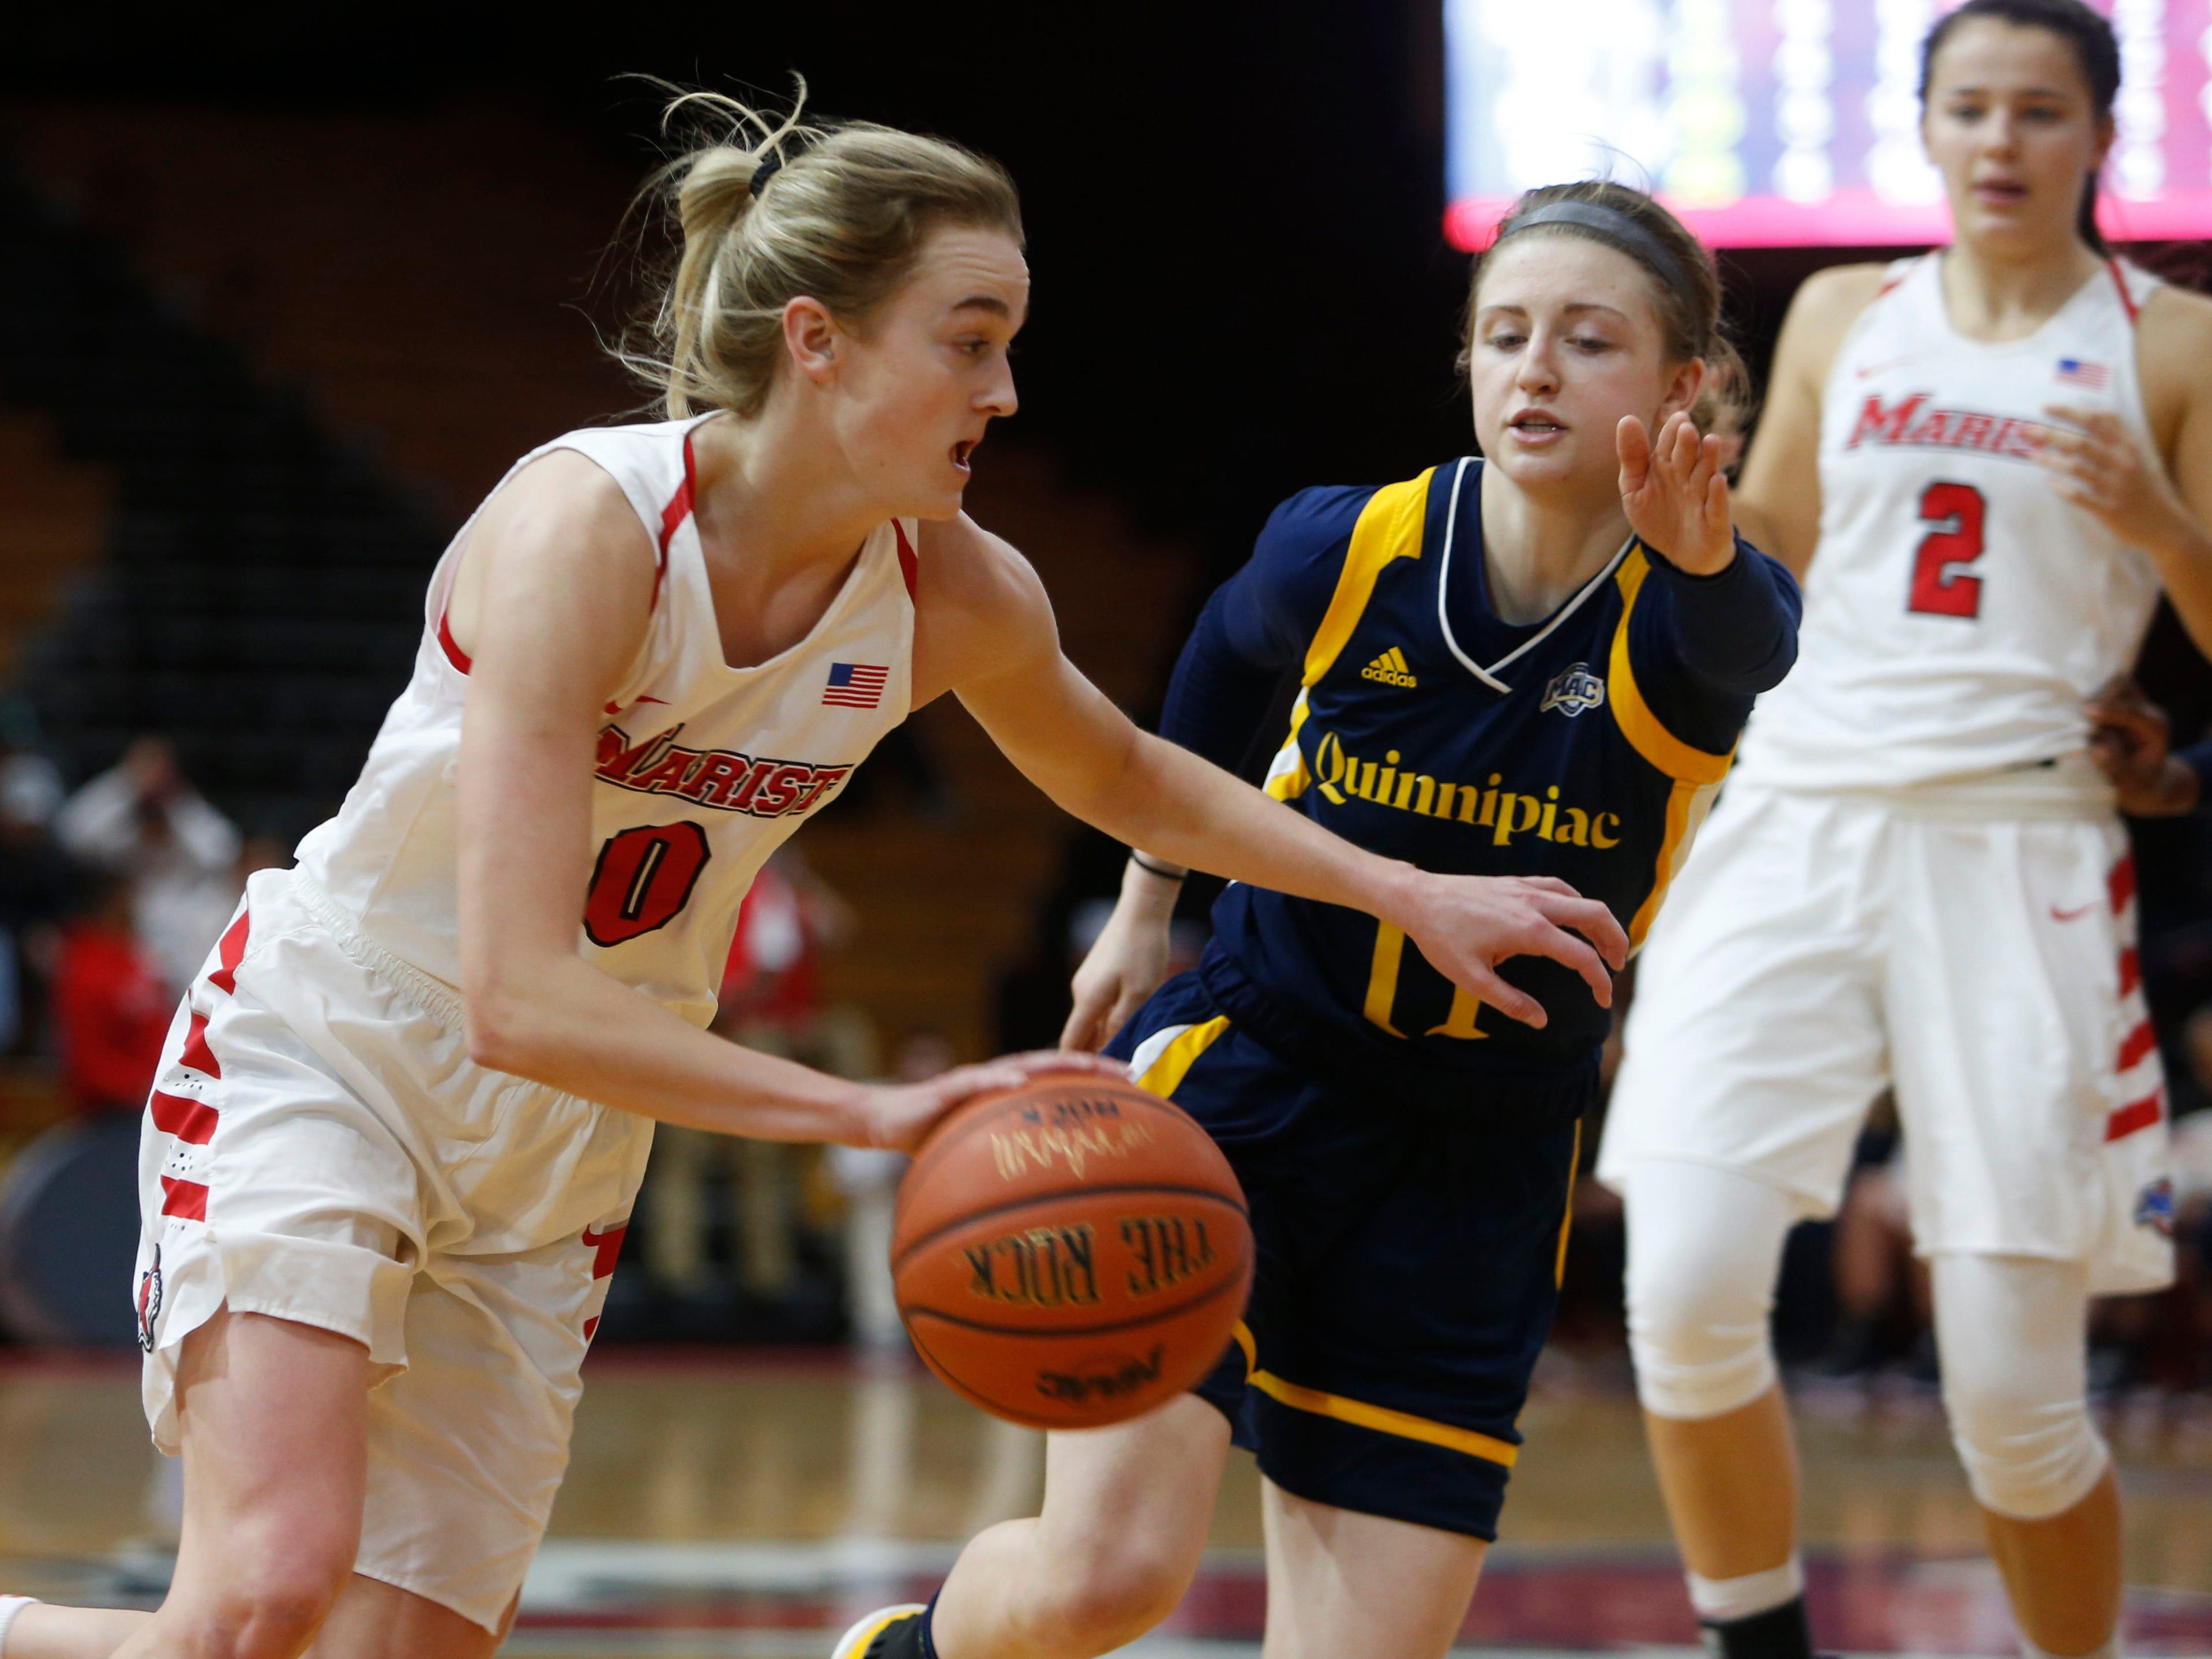 Marist College's Grace Vander Weide drives to the basket against Quinnipiac on Jan. 10.